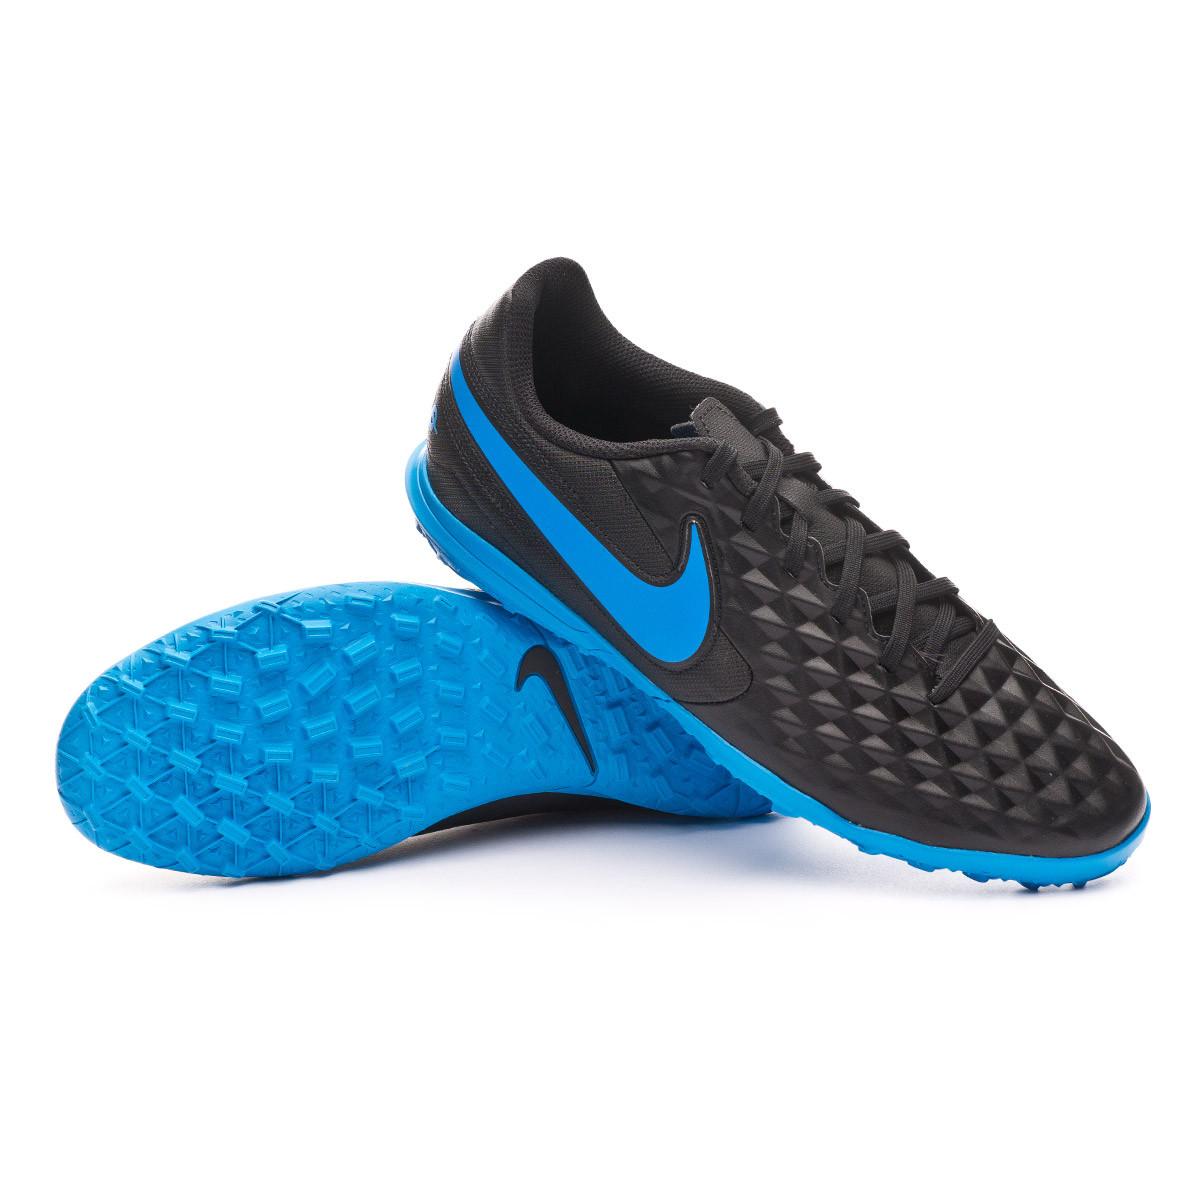 Chuteira Nike Tiempo Legend VIII Club Turf